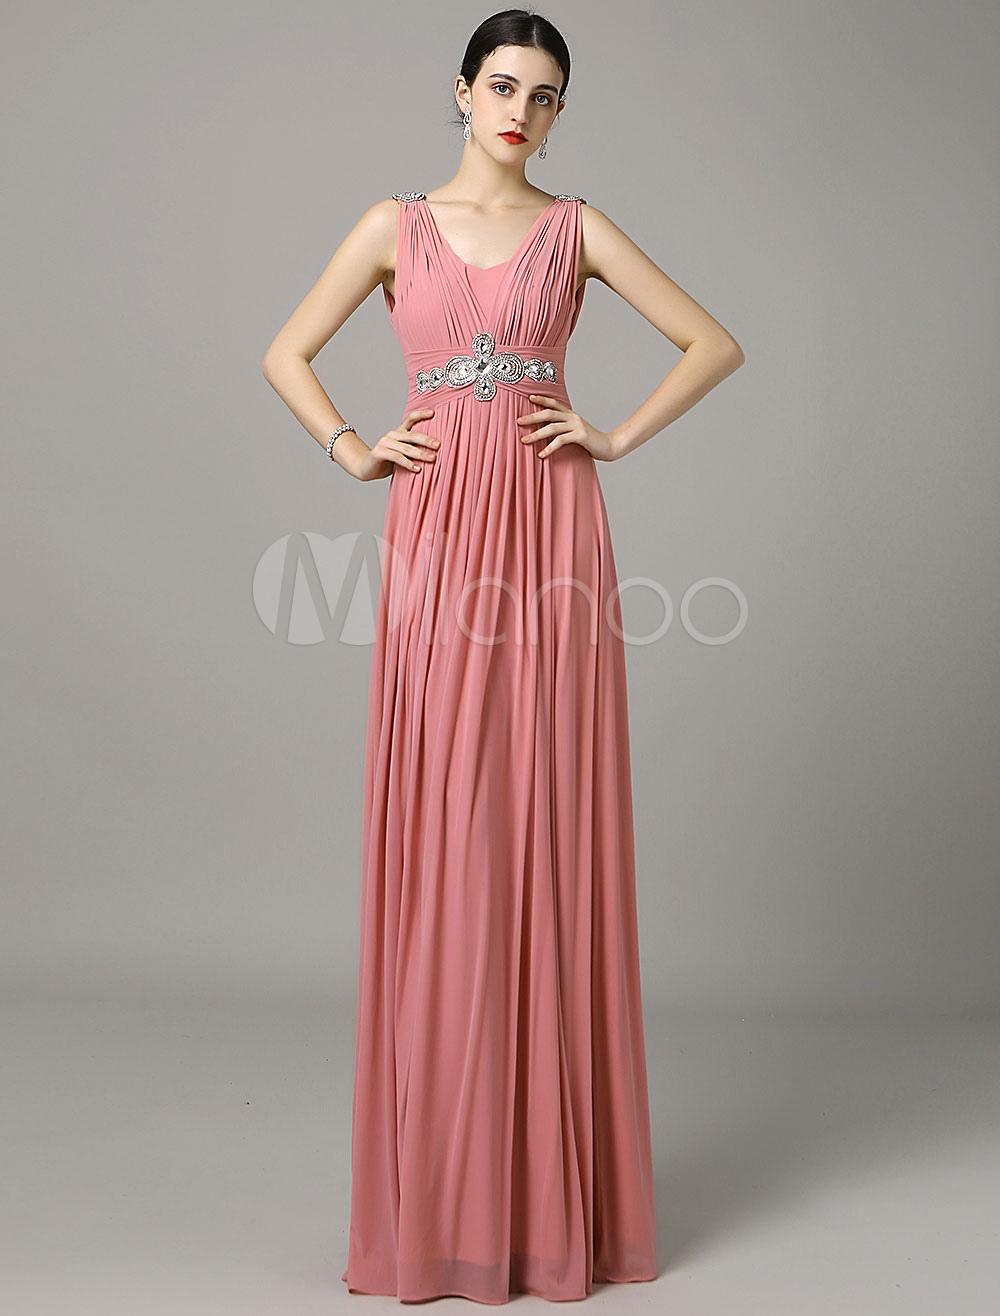 A-Line Pink Chiffon Prom Dress With V-Neck Sash (Wedding Prom Dresses) photo